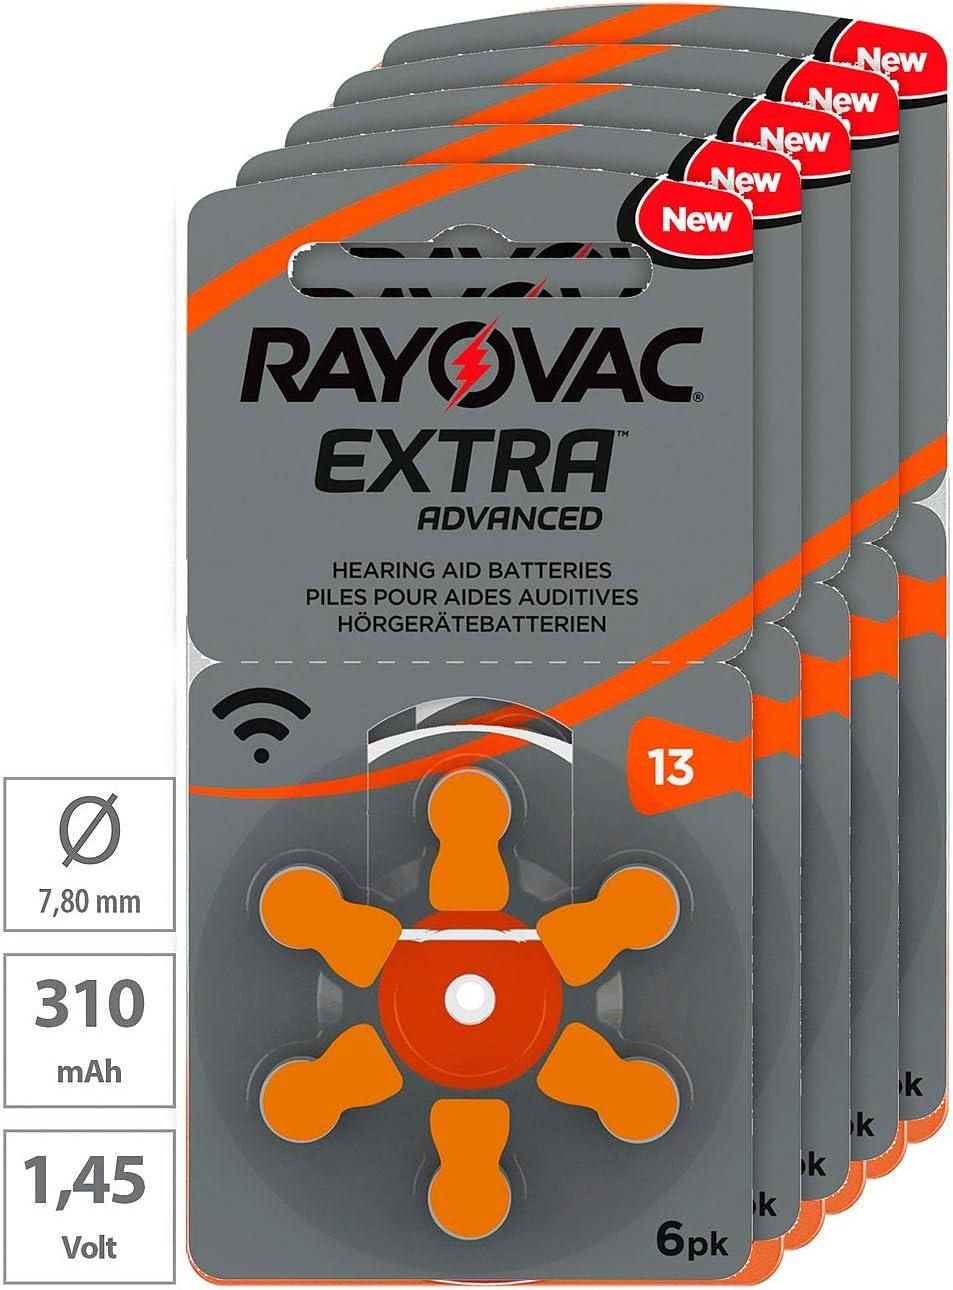 Rayovac Hearing Aid Batteries 13 Extra Advanced 1 45 V Elektronik